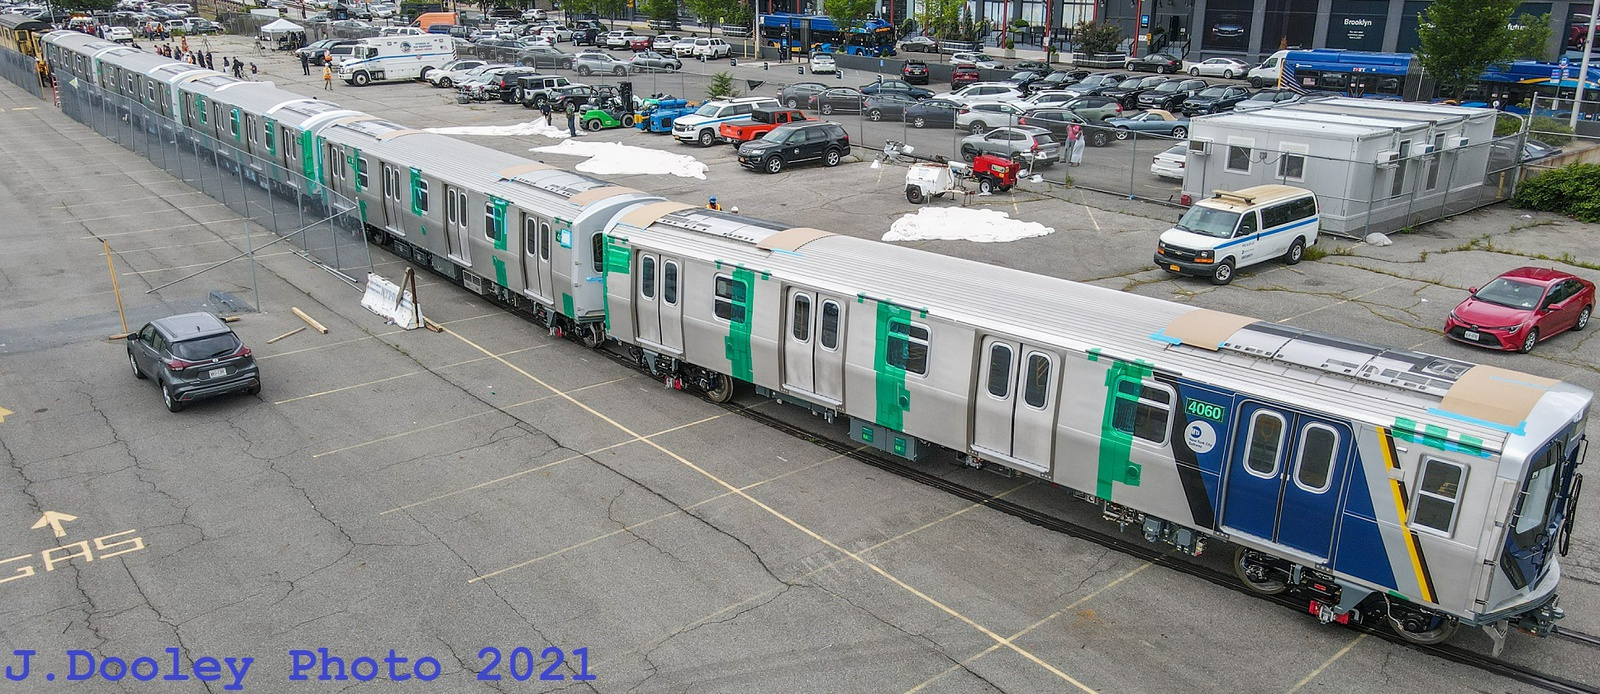 (629k, 1600x694)<br><b>Country:</b> United States<br><b>City:</b> New York<br><b>System:</b> New York City Transit<br><b>Car:</b> R-211 (Kawasaki, 2021-) 4060-4064 <br><b>Photo by:</b> John Dooley<br><b>Date:</b> 7/1/2021<br><b>Notes:</b> R-211 delivery and press conference.<br><b>Viewed (this week/total):</b> 3 / 502